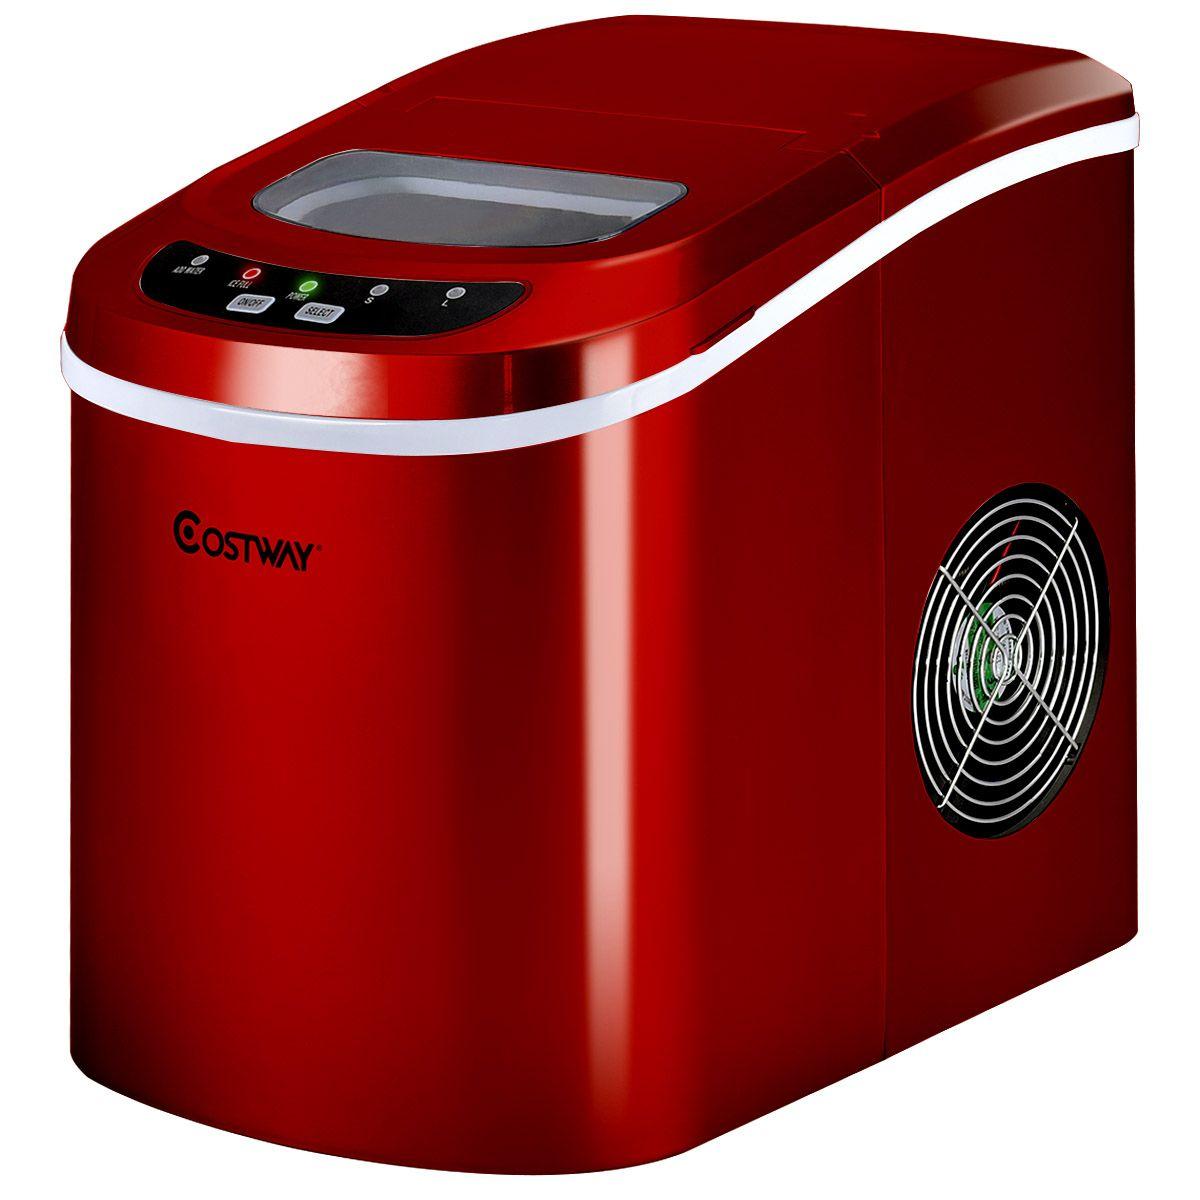 Mini Portable Compact Electric Ice Maker Machine Red In 2020 Ice Maker Machine Portable Ice Maker Ice Maker